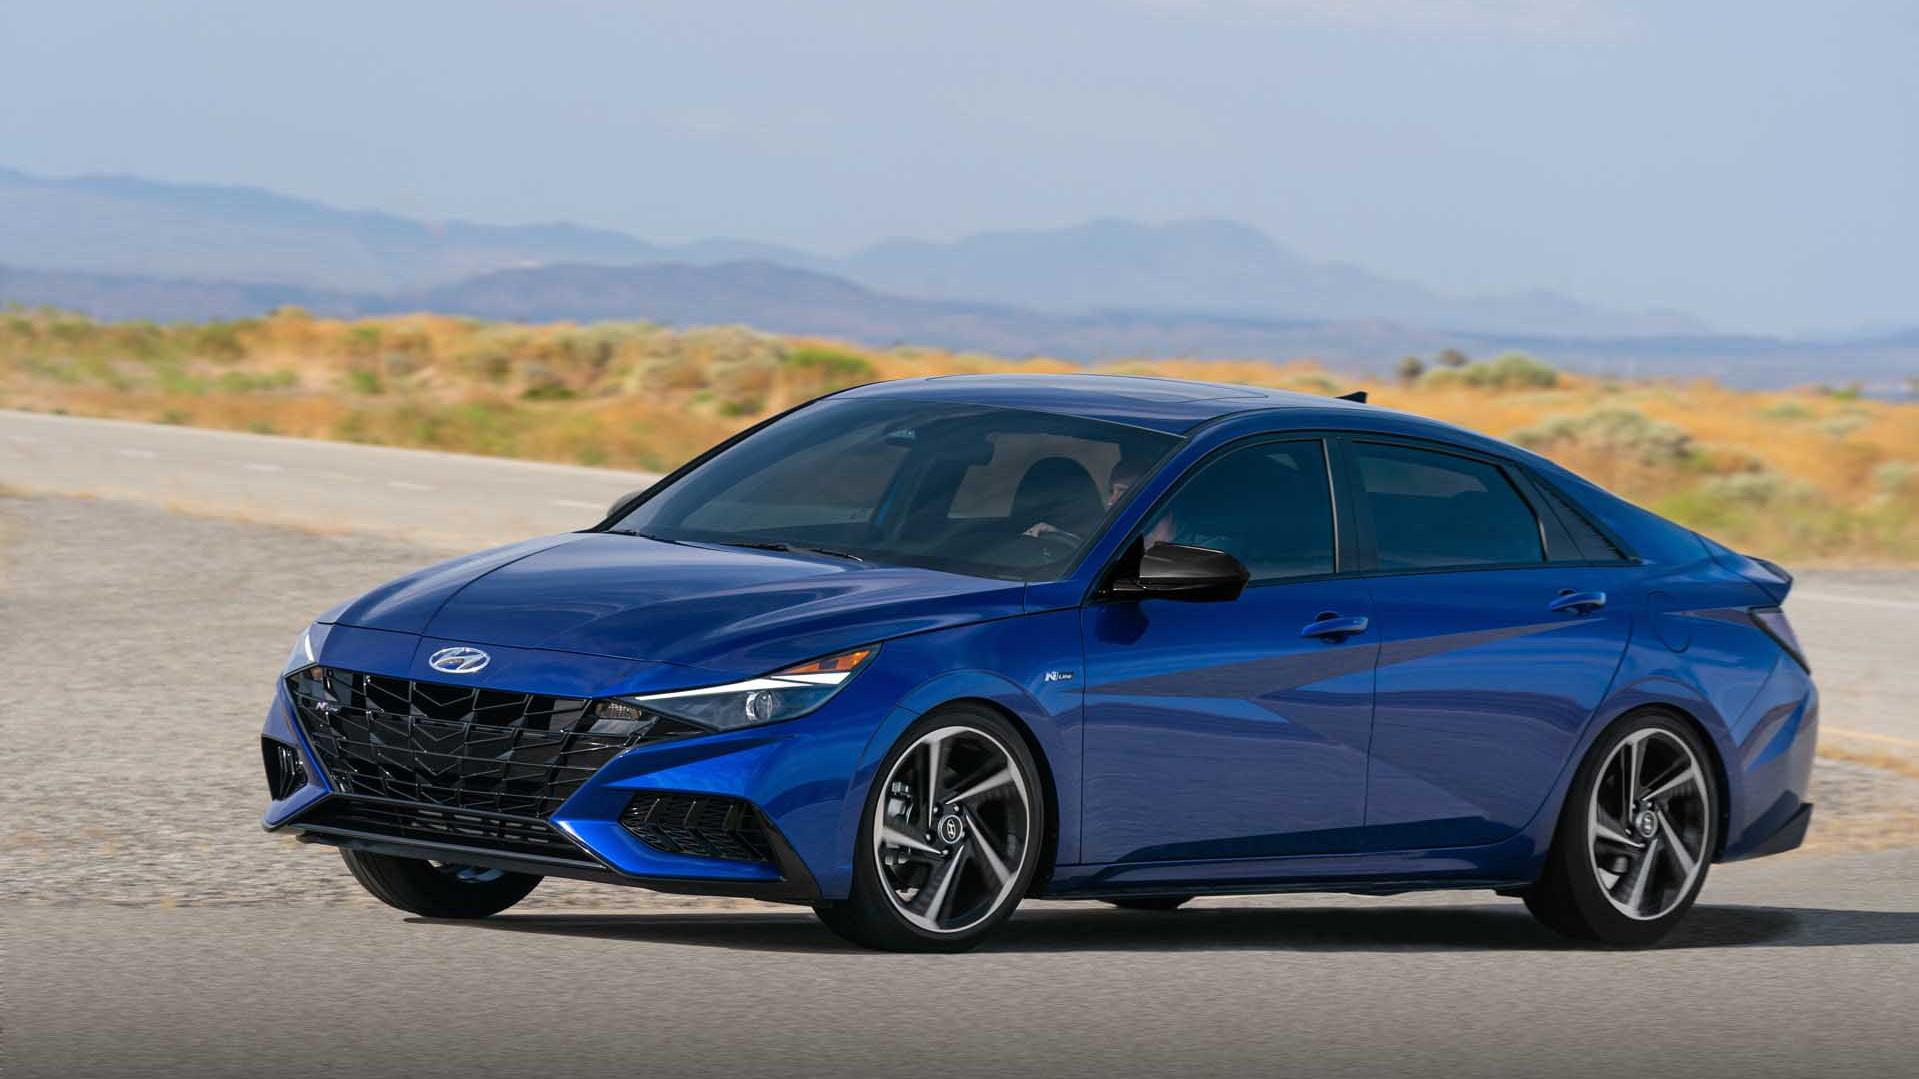 2021 Hyundai Sonata Hybrid Sport Wallpaper